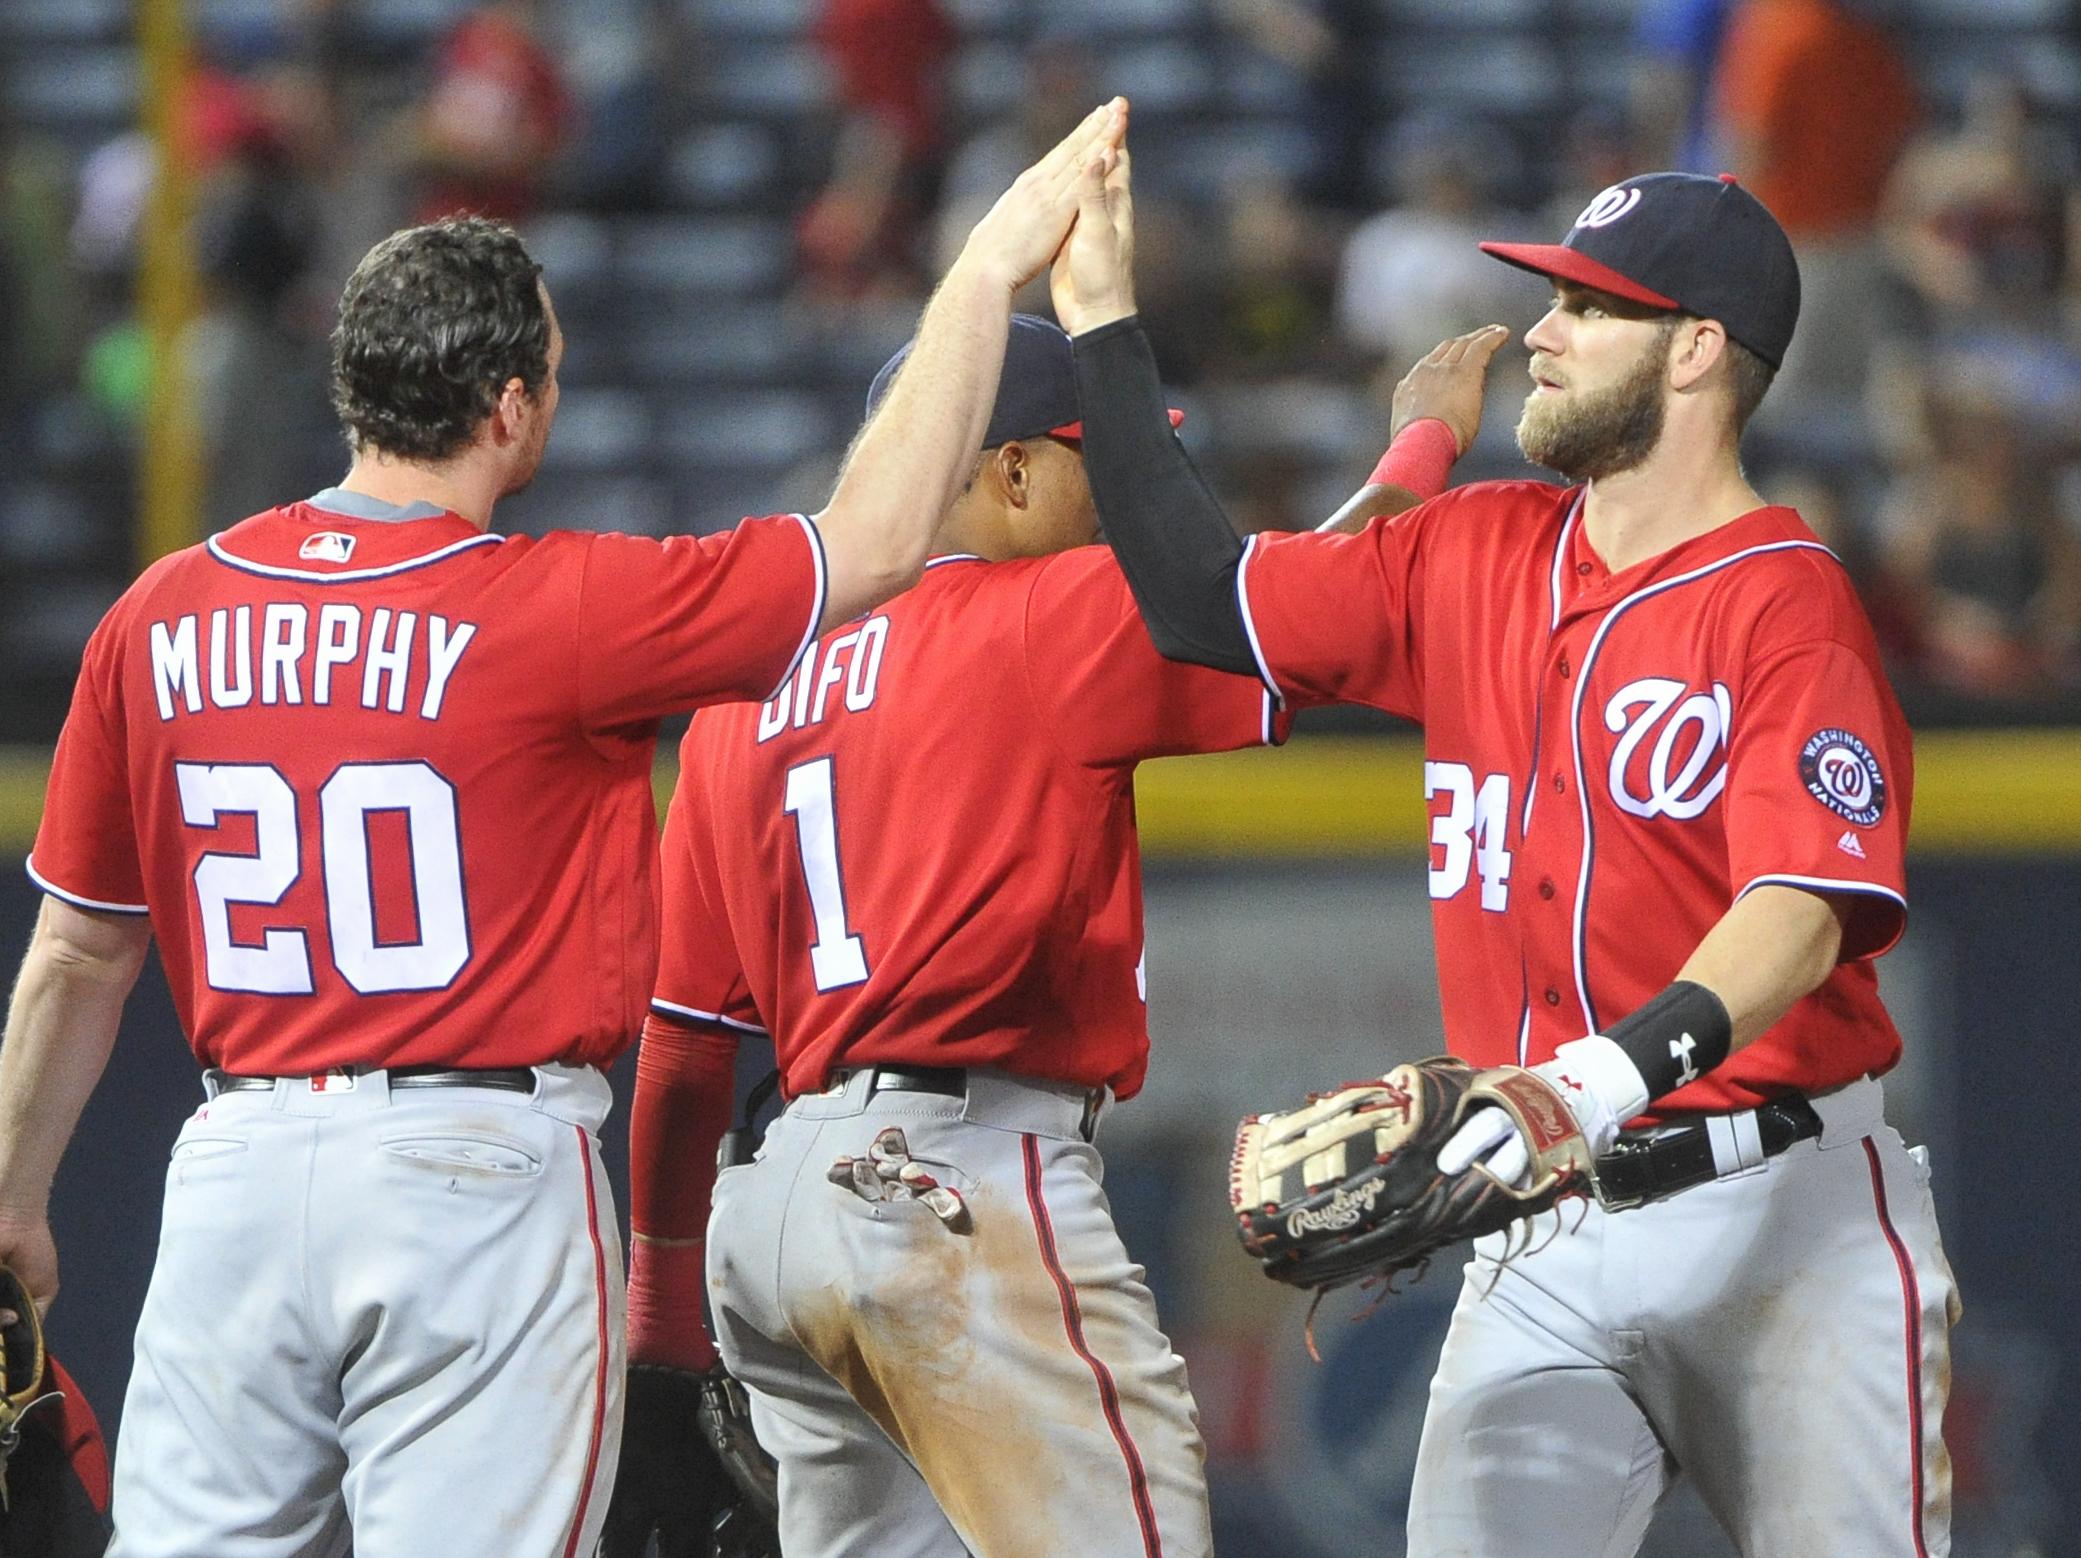 Washington Nationals' Daniel Murphy (20) and Bryce Harper (34) celebrate after the ninth inning of baseball game against the Atlanta Braves, Saturday, Aug. 20, 2016, in Atlanta. Washington won 11-9. (AP Photo/John Amis)